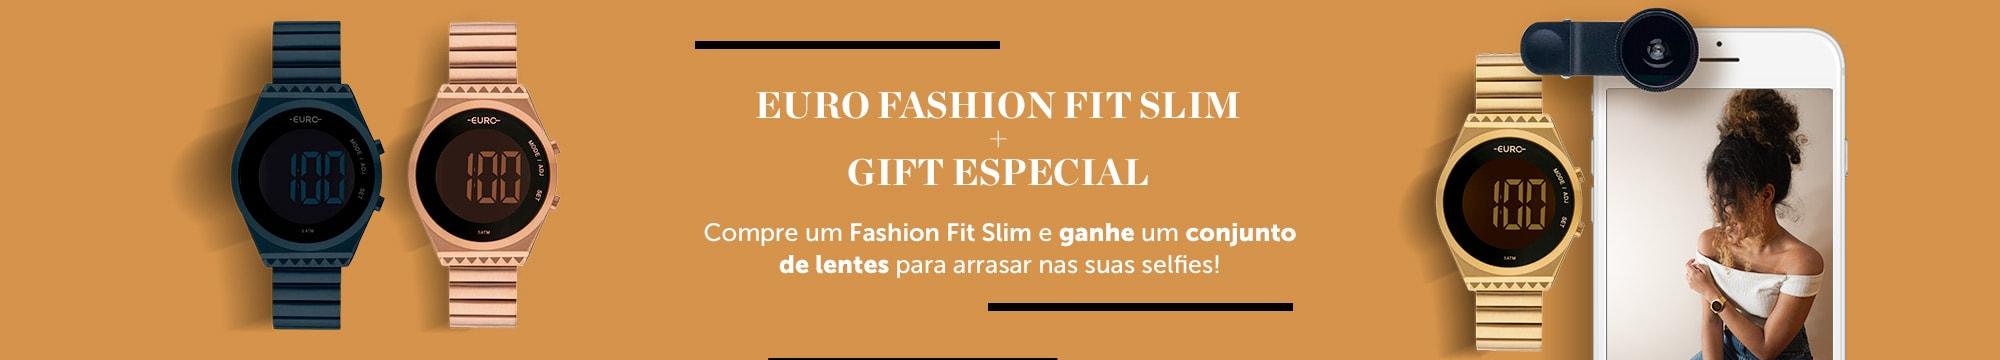 FF Slim Gift